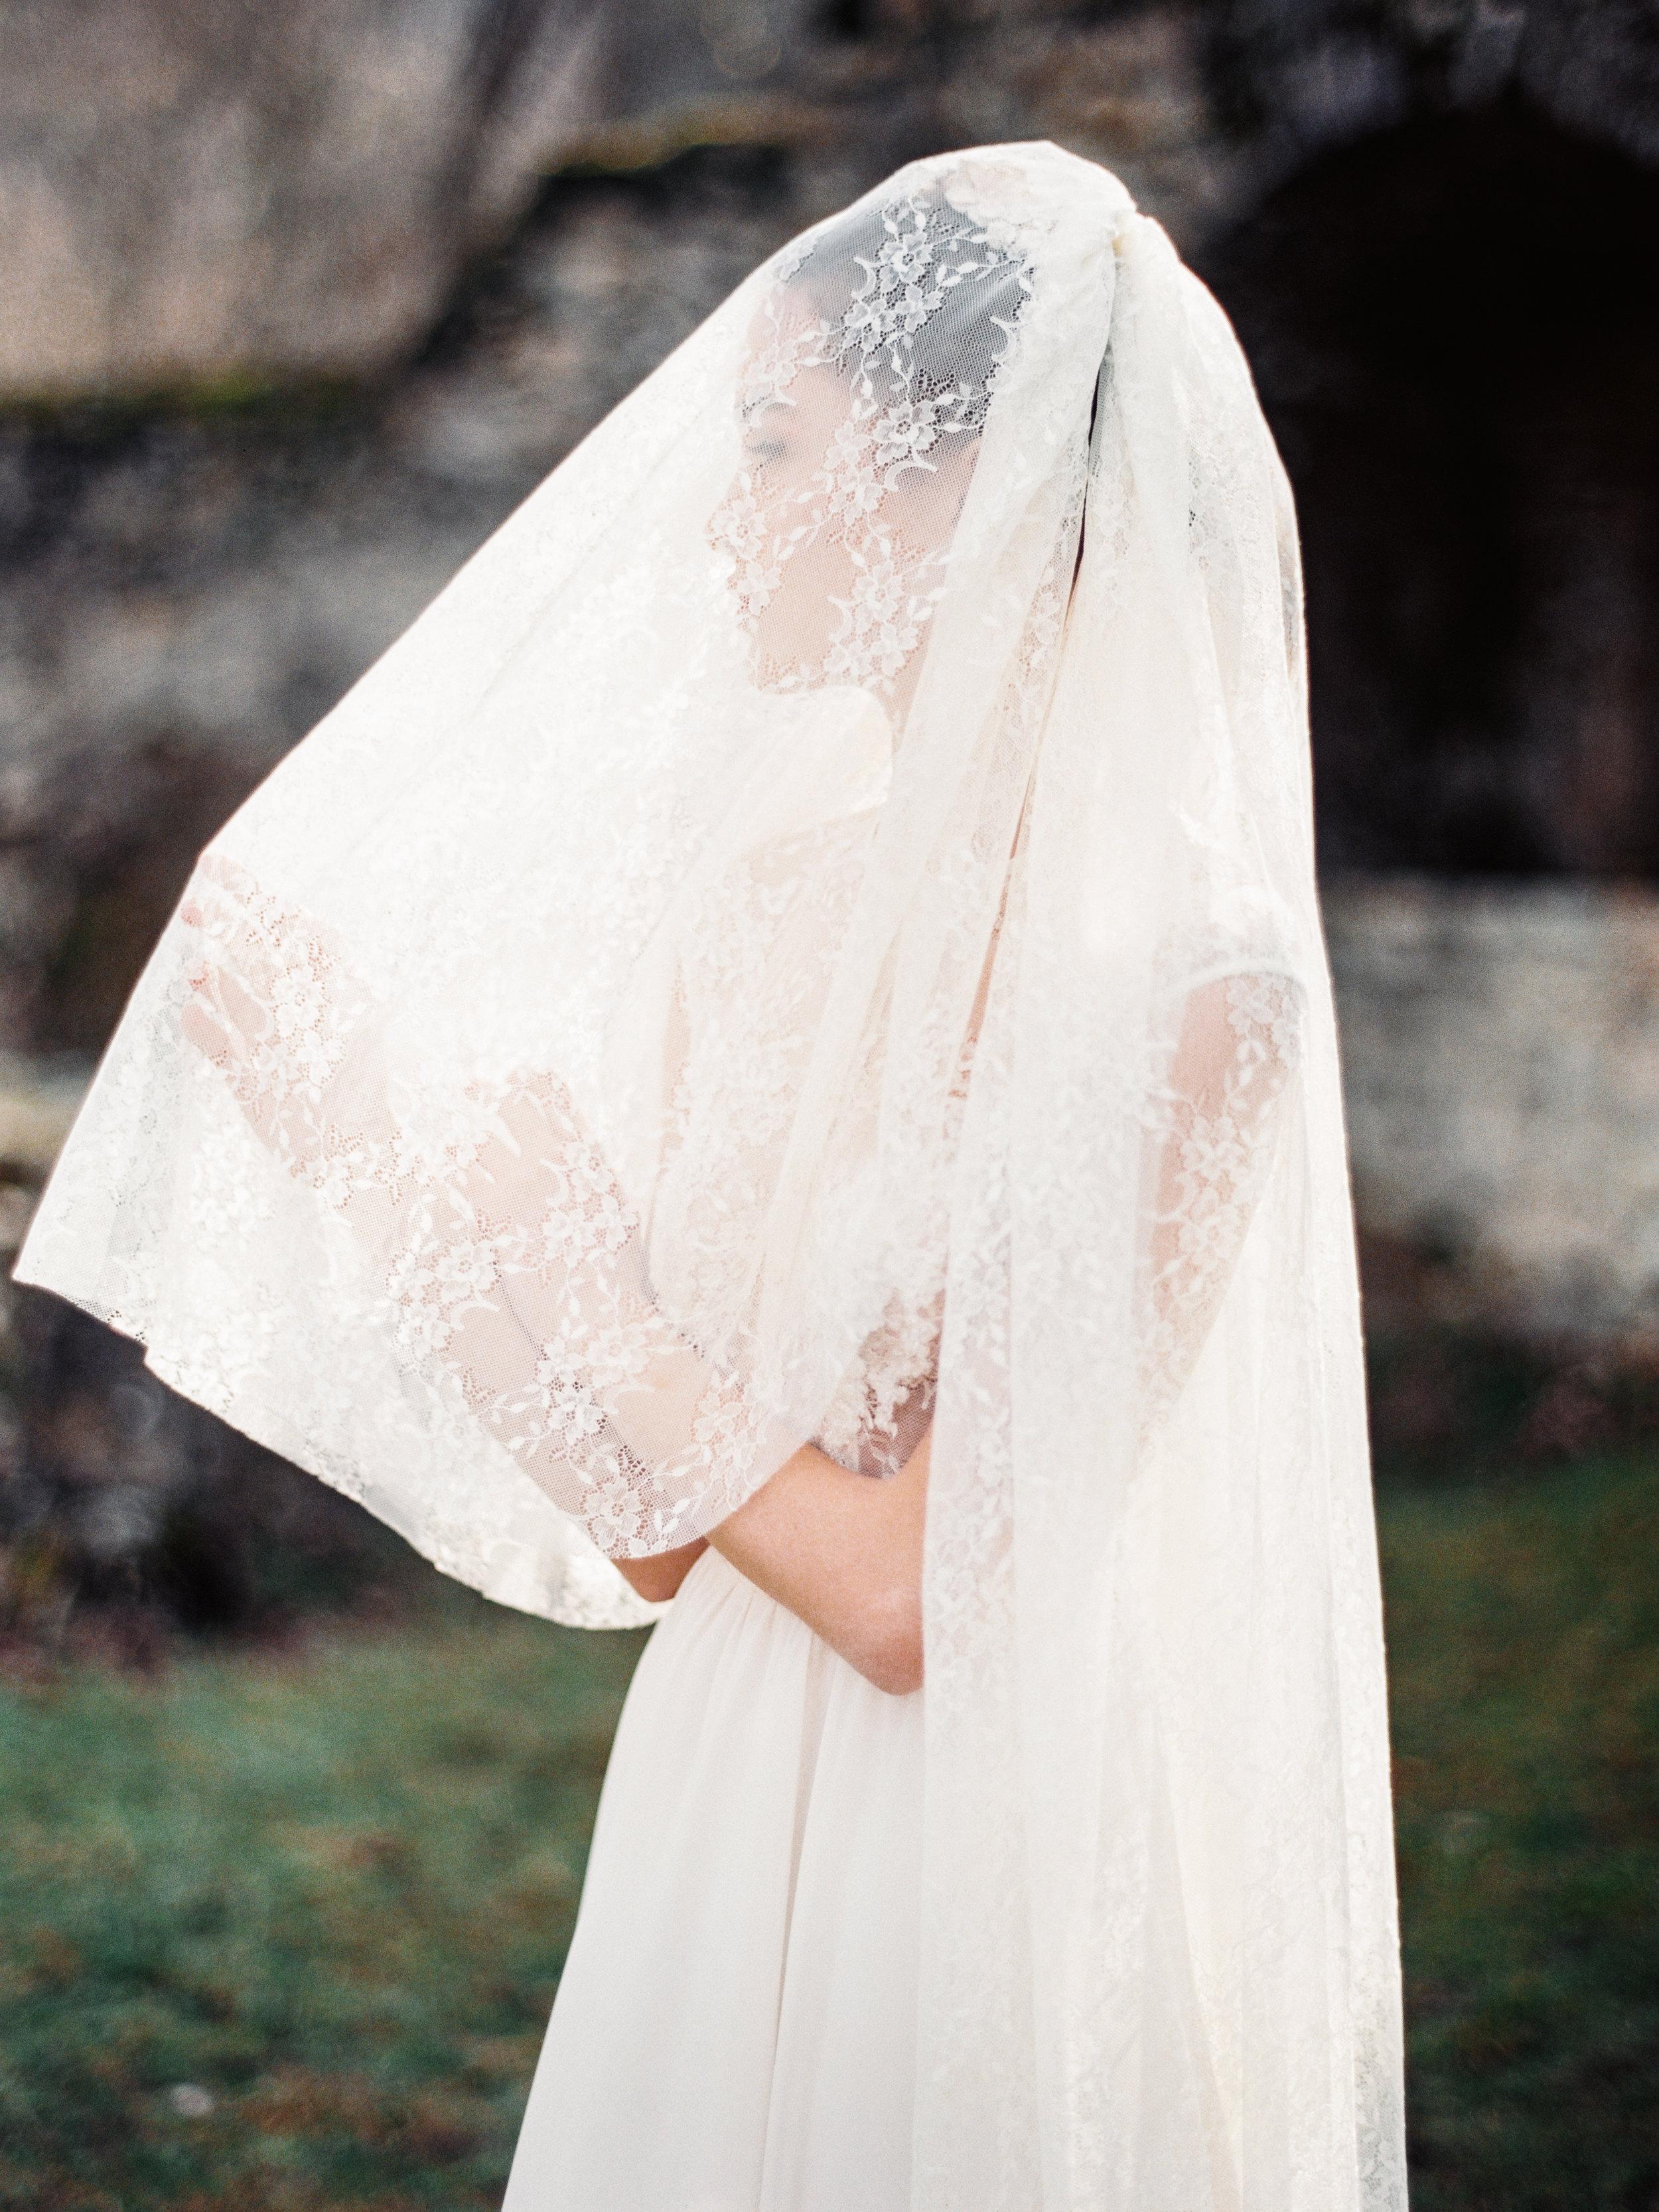 TamaraGigolaphotography,Cathytelle,royalweddingdress,kakheti-0041-6.JPG